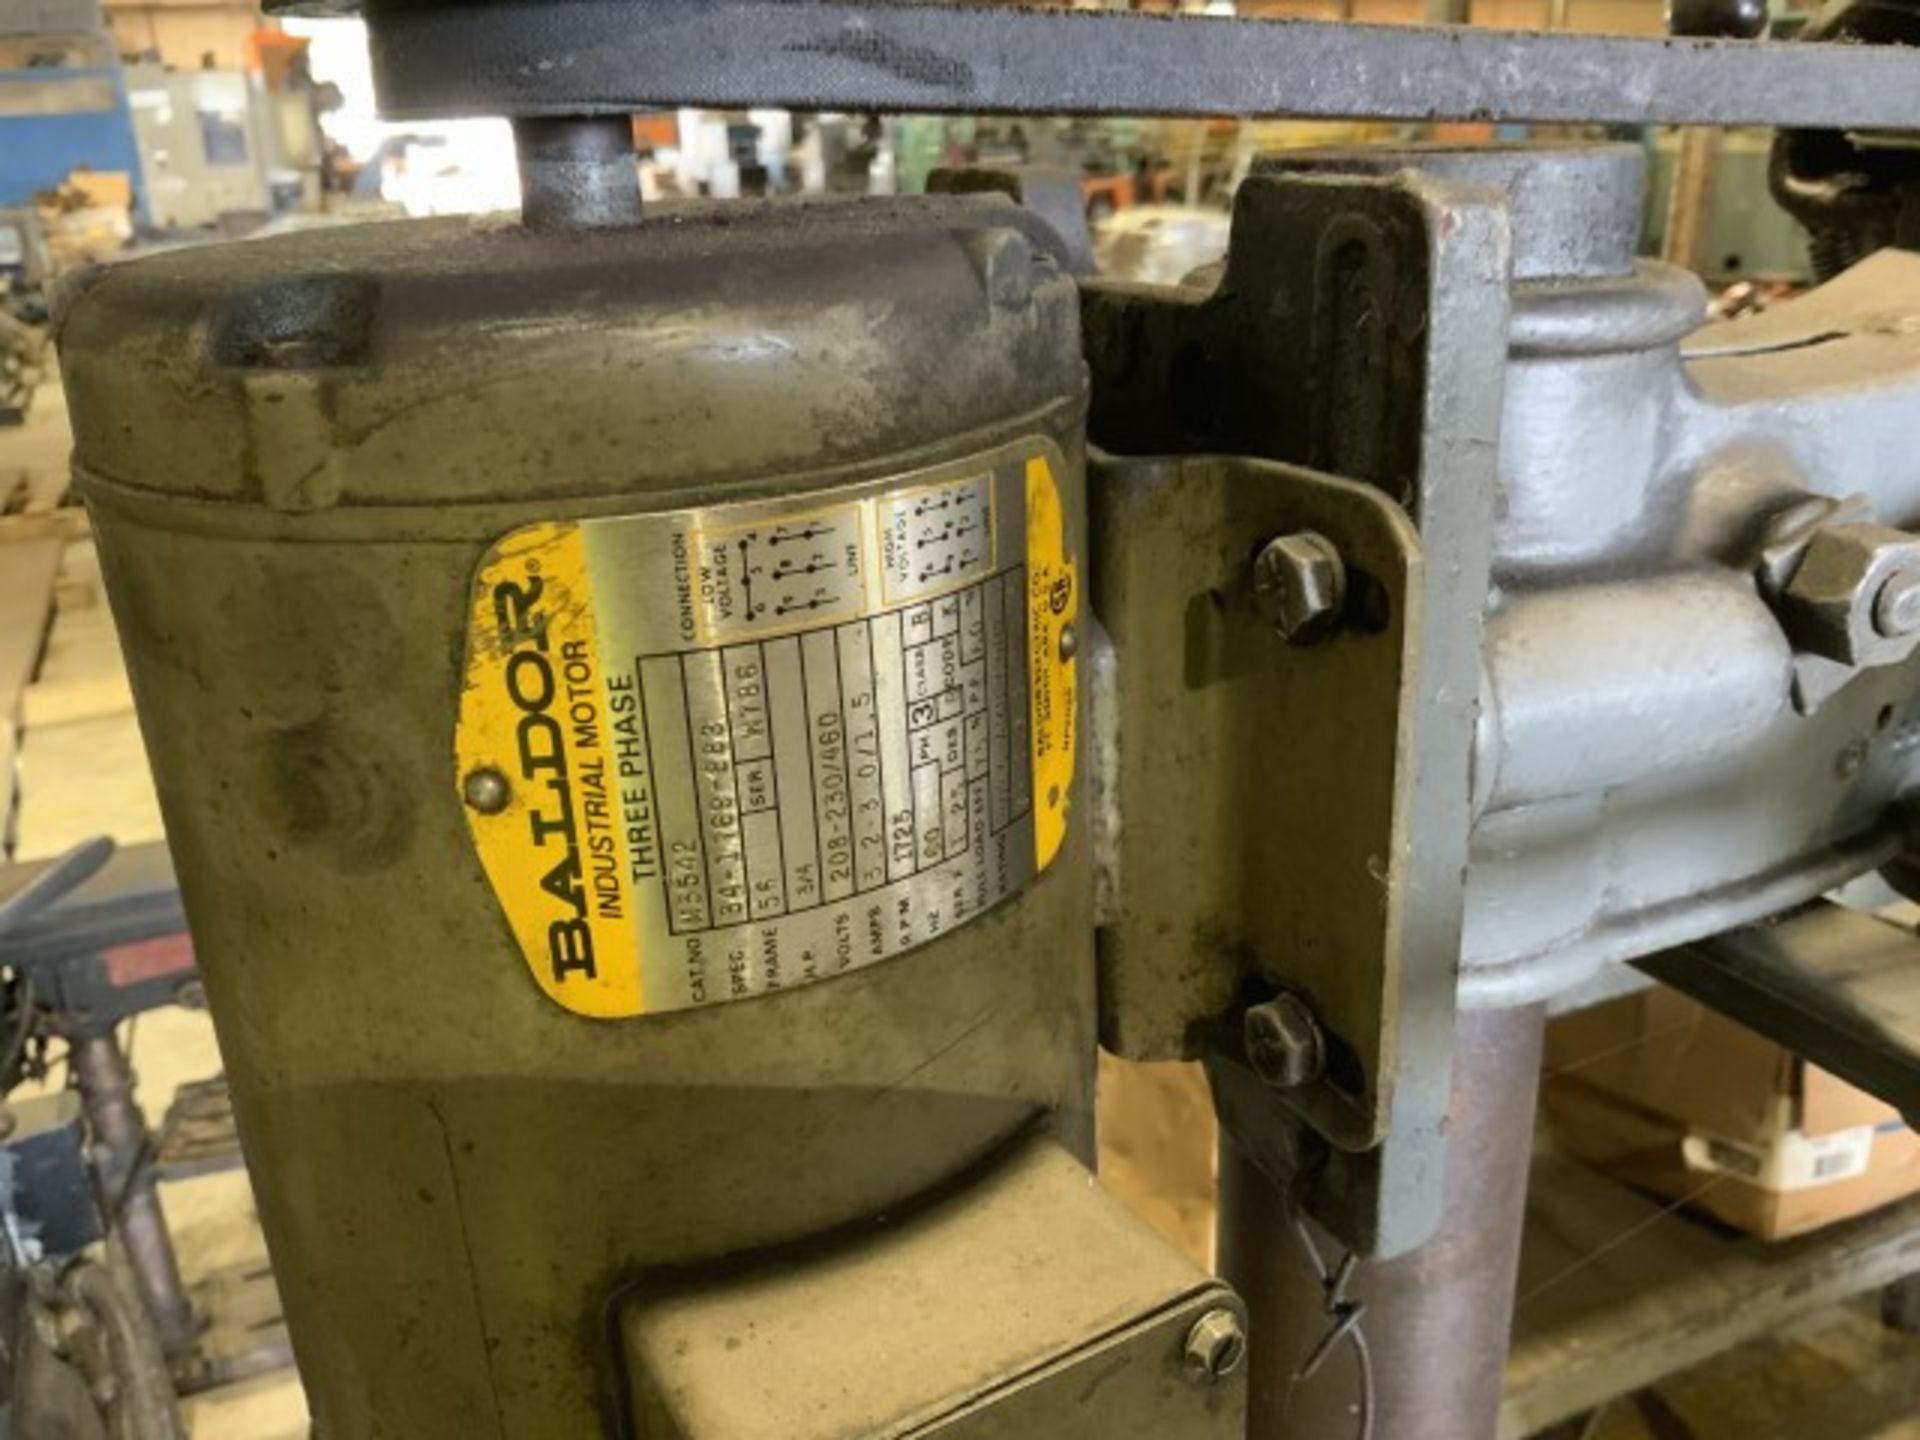 Drill press - Image 3 of 4